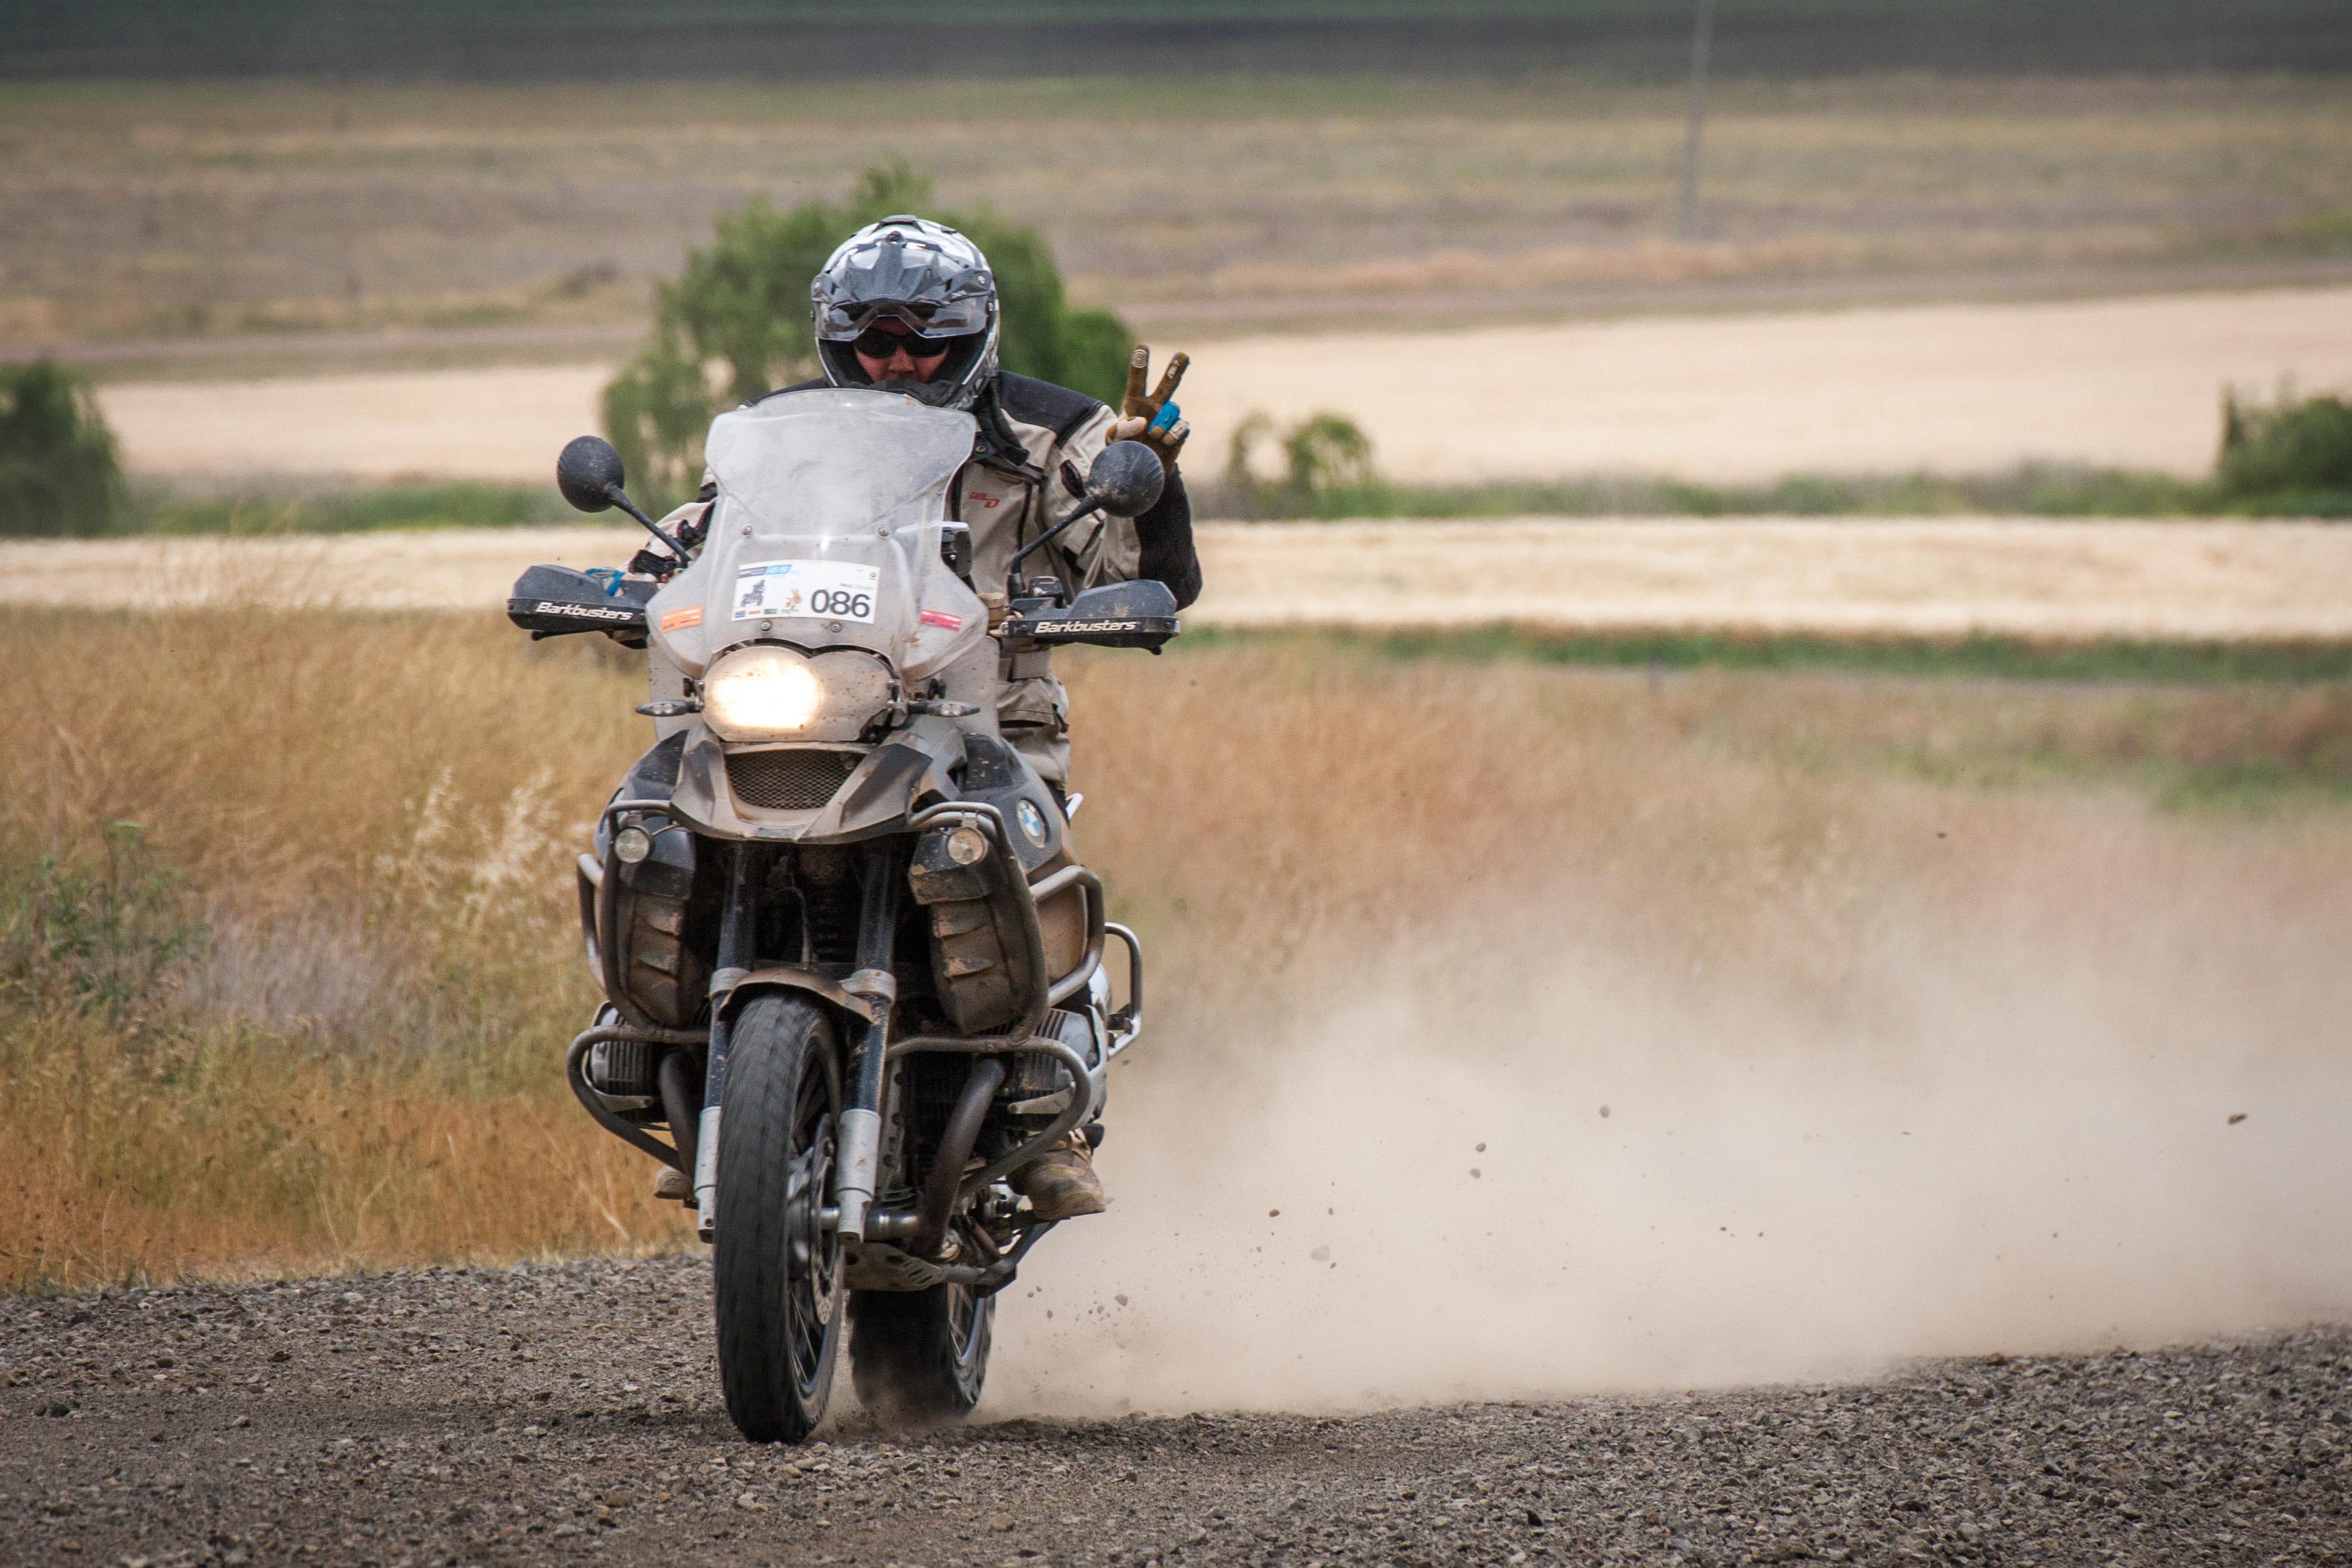 BMW GS Safari 2016 - Another epic adventure